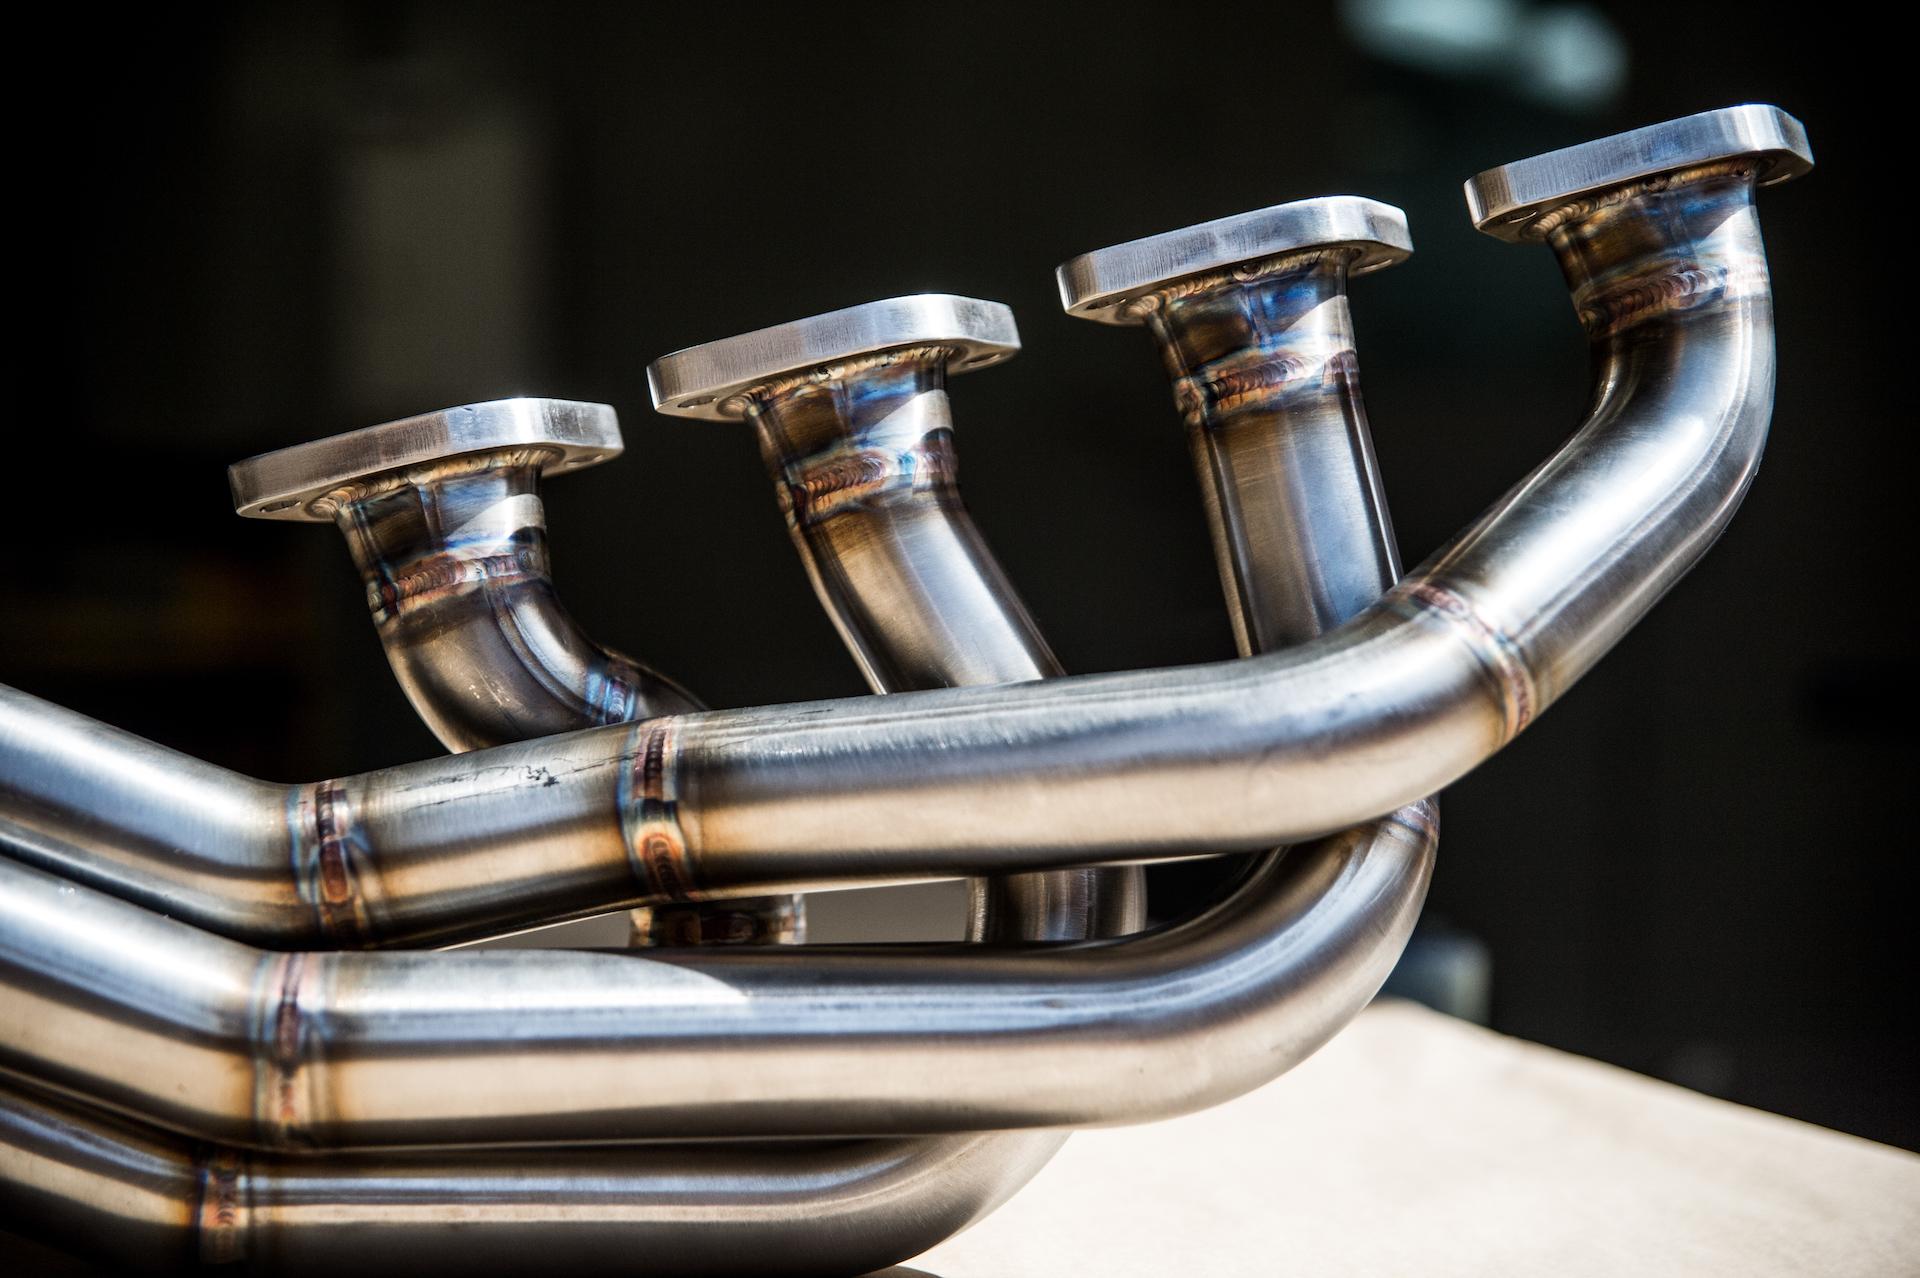 Custom made high performance manifold.